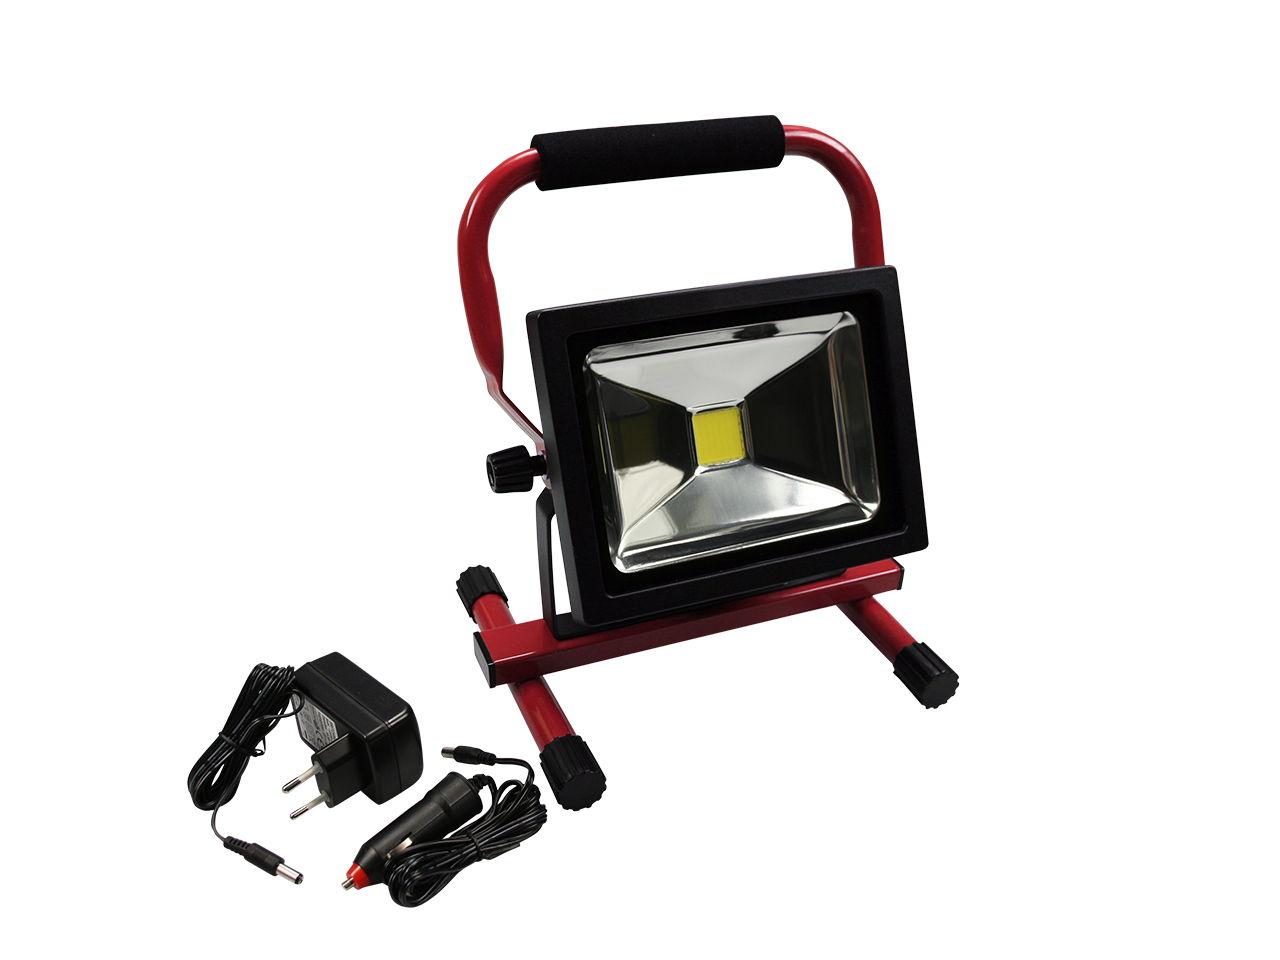 671 Alfa LED Baustrahler 20 W mit Akku